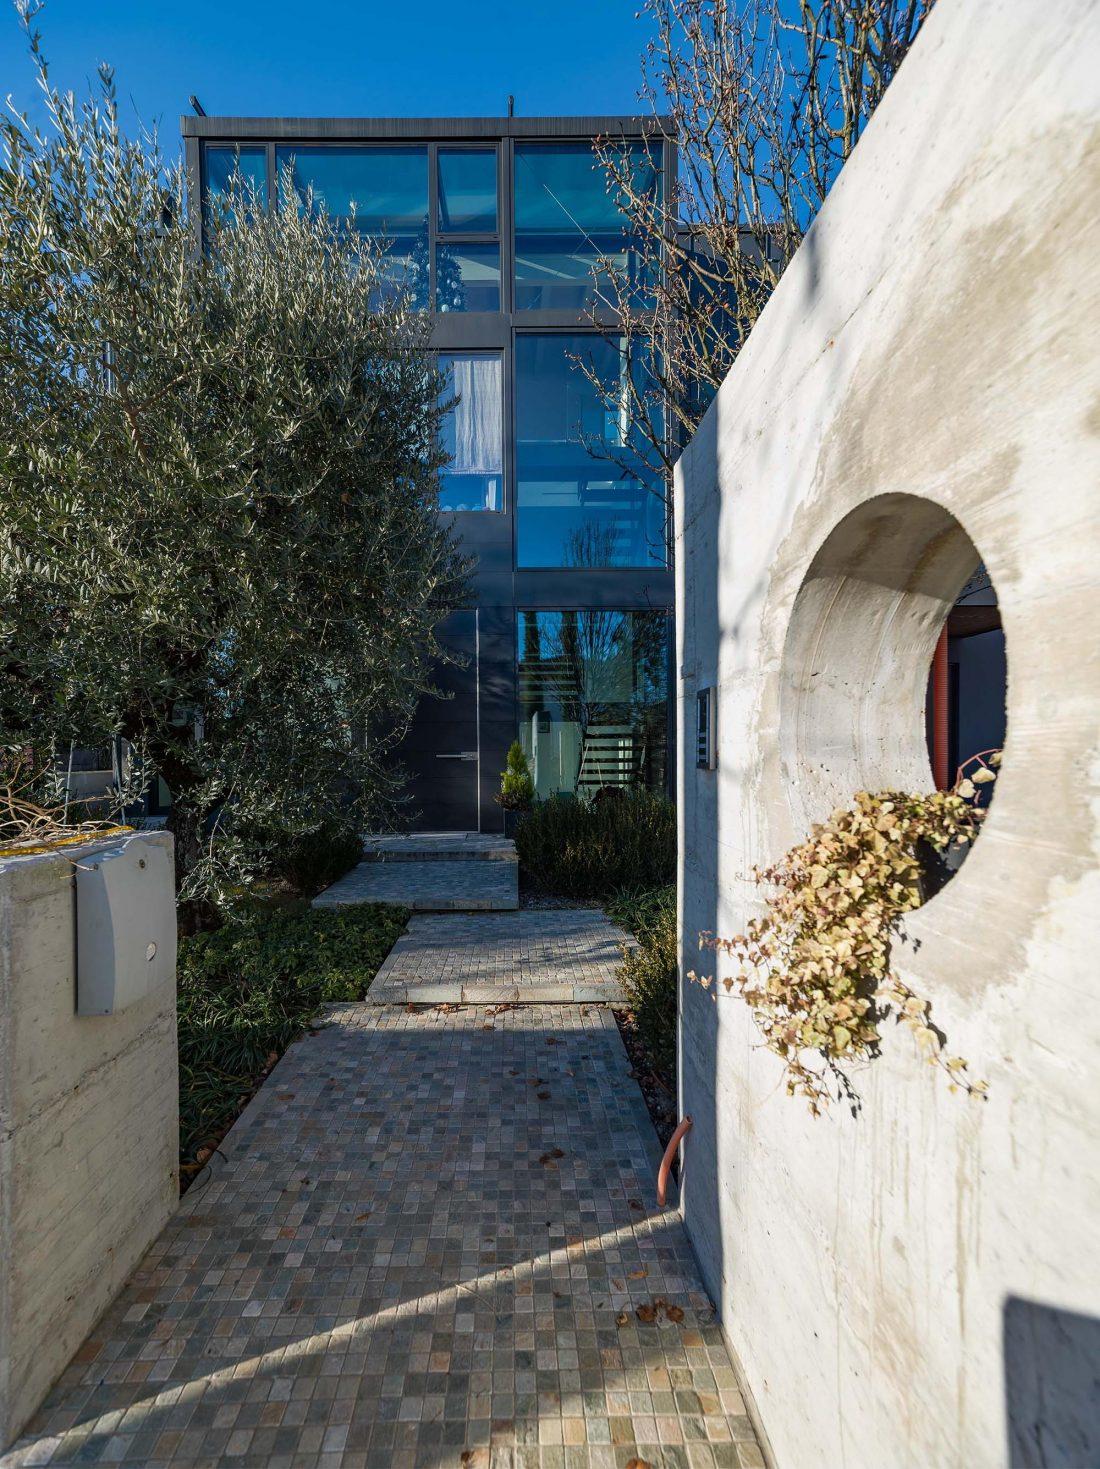 Дом в Порденоне, Италия, от студии Caprioglio Associati Architects 34